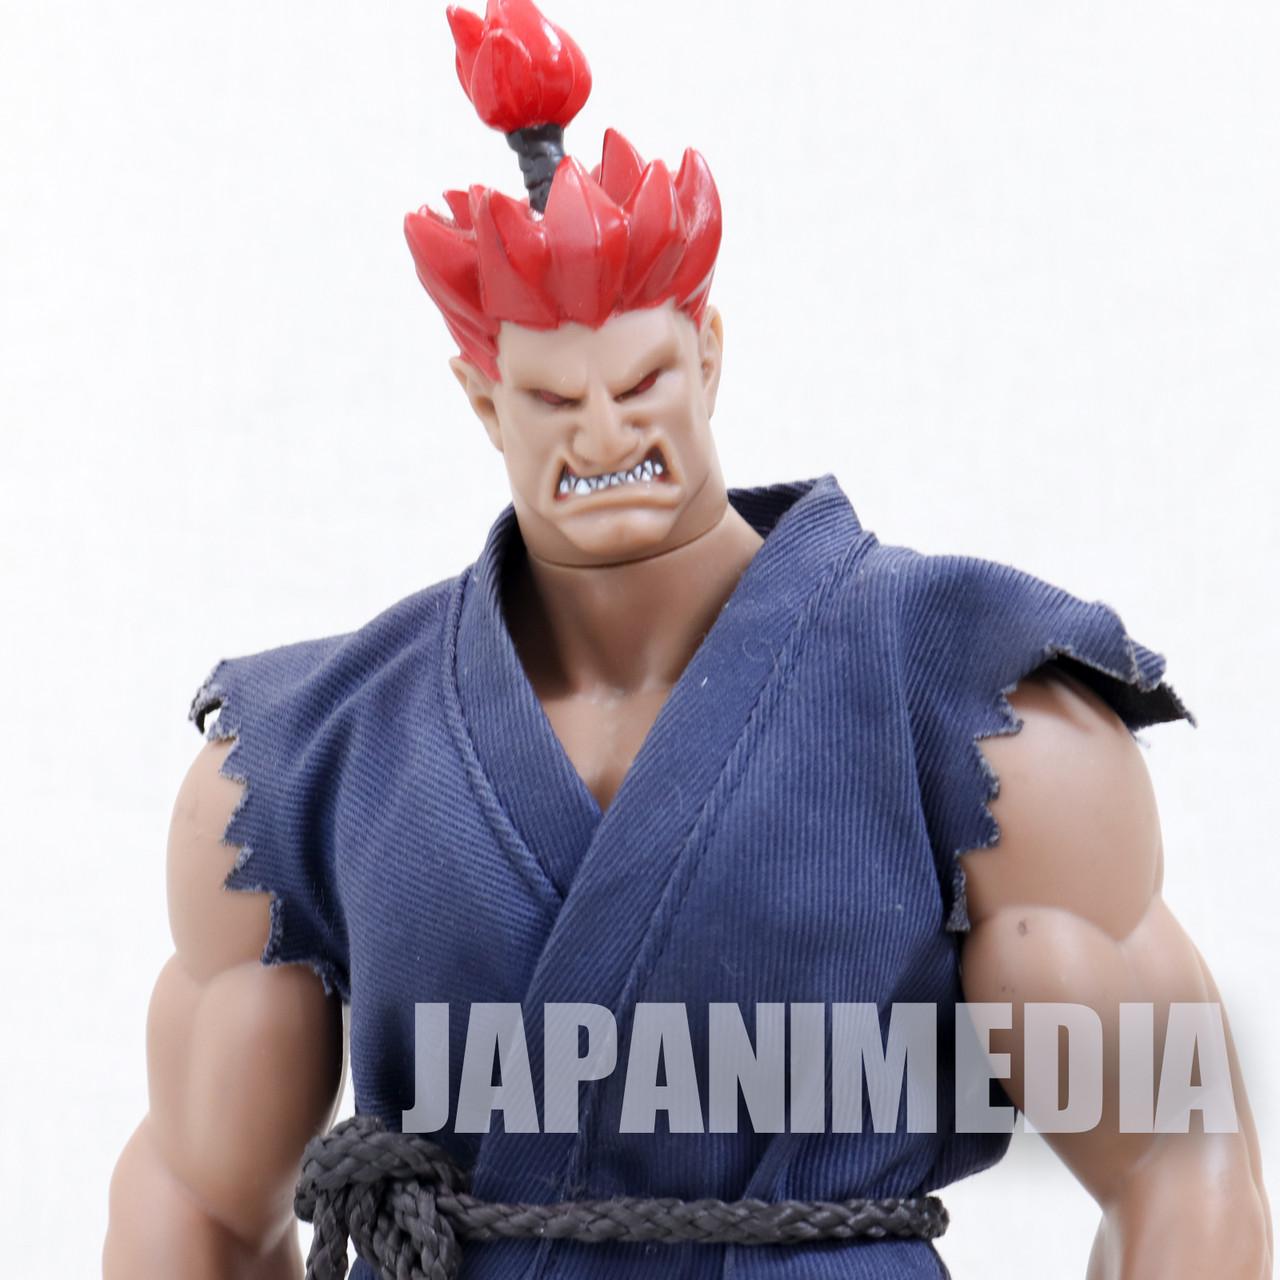 SET OF 12 CAPCOM STREET FIGHTER MINI RUBBER FIGURE KEYCHAIN ANIME MANGA JAPAN